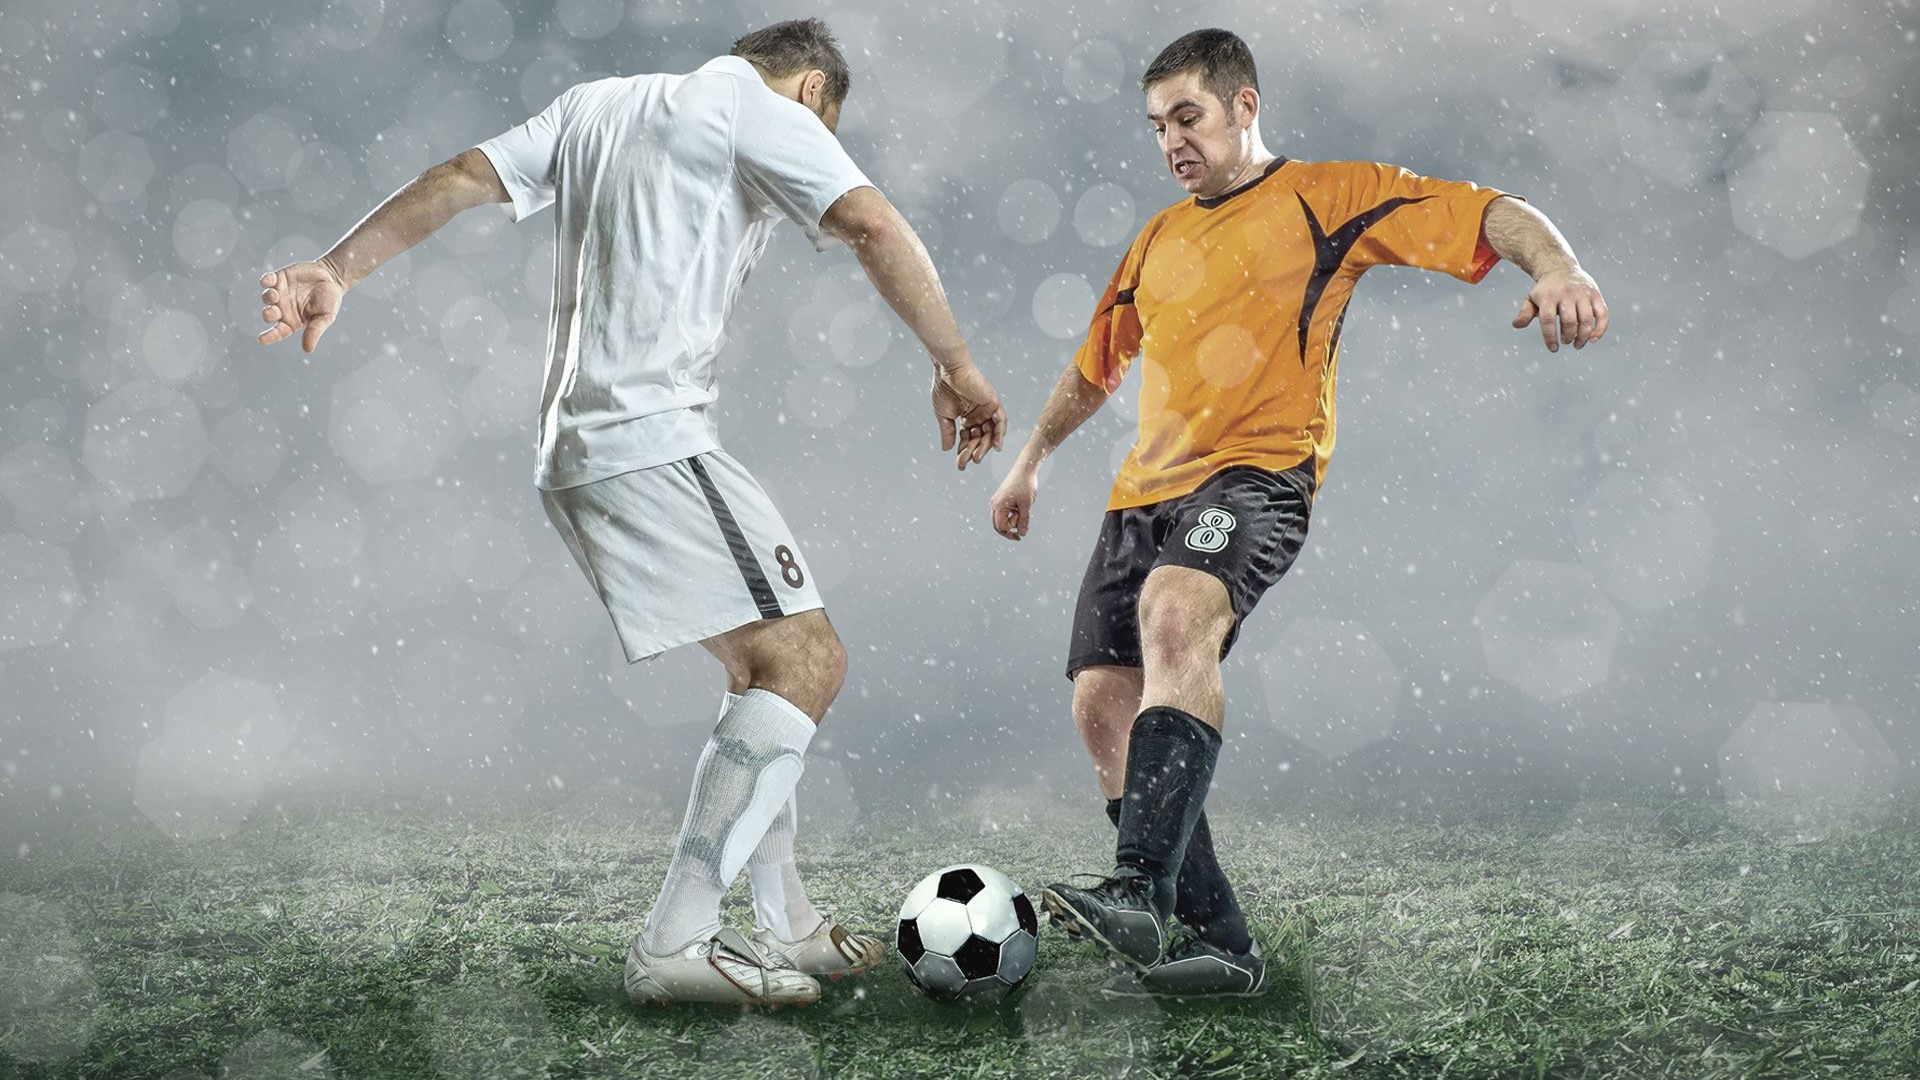 watch-huddersfield-giants-vs-castleford-tigers-live